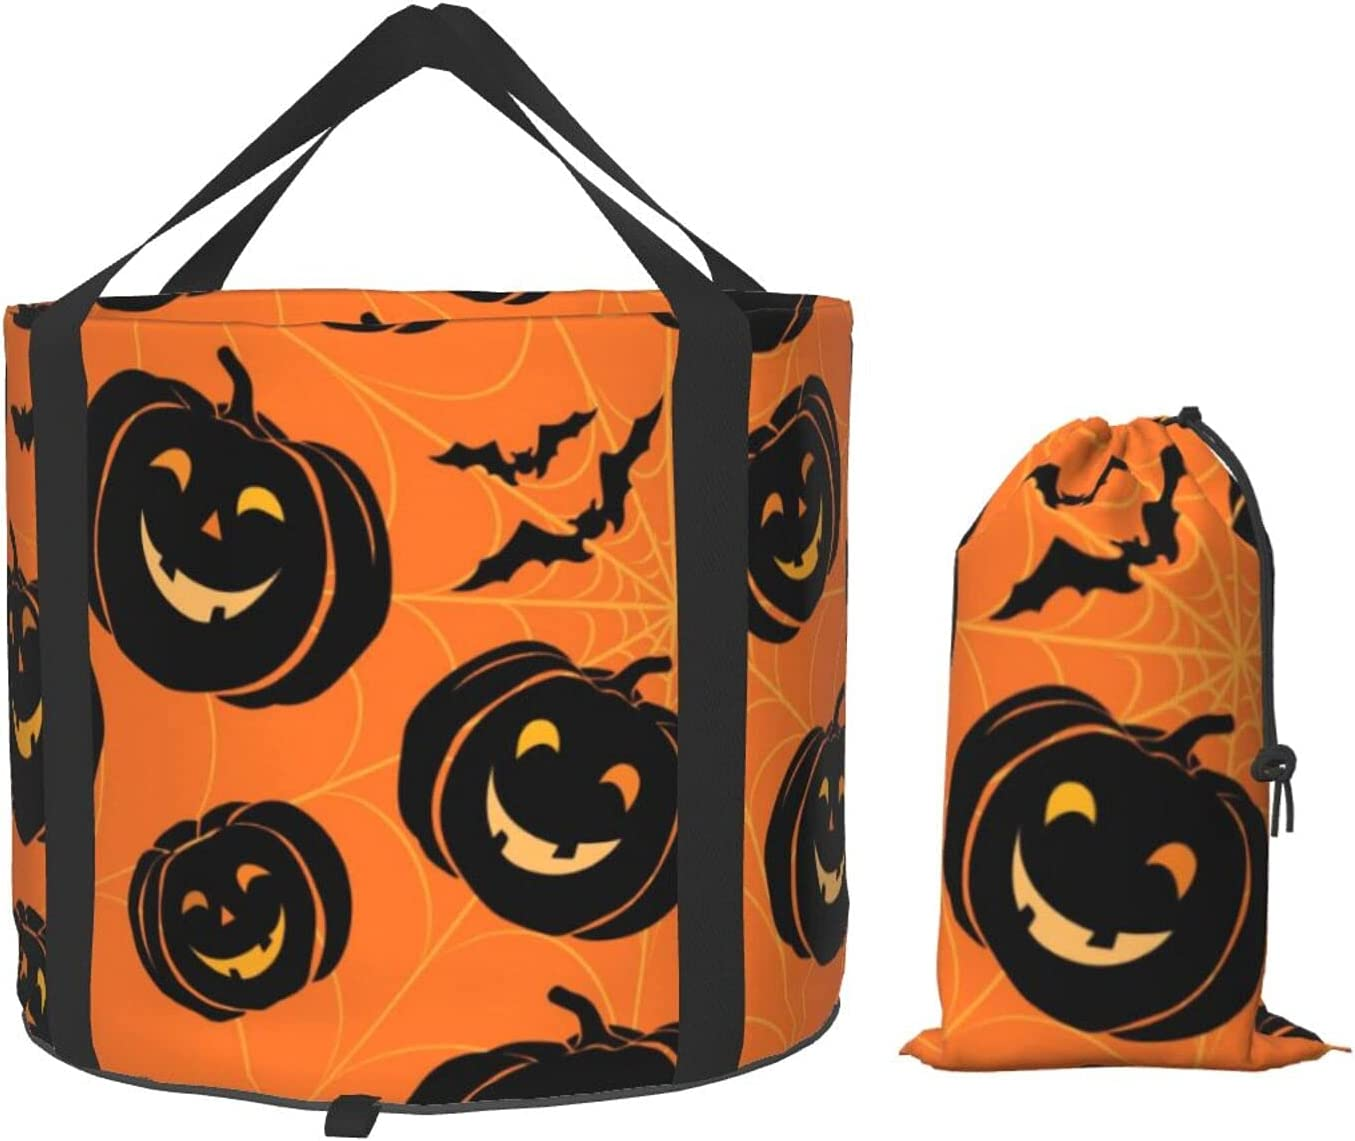 New item Halloween Bombing free shipping Pumpkin Bat Spider Bucket Multifunctional Collapsible